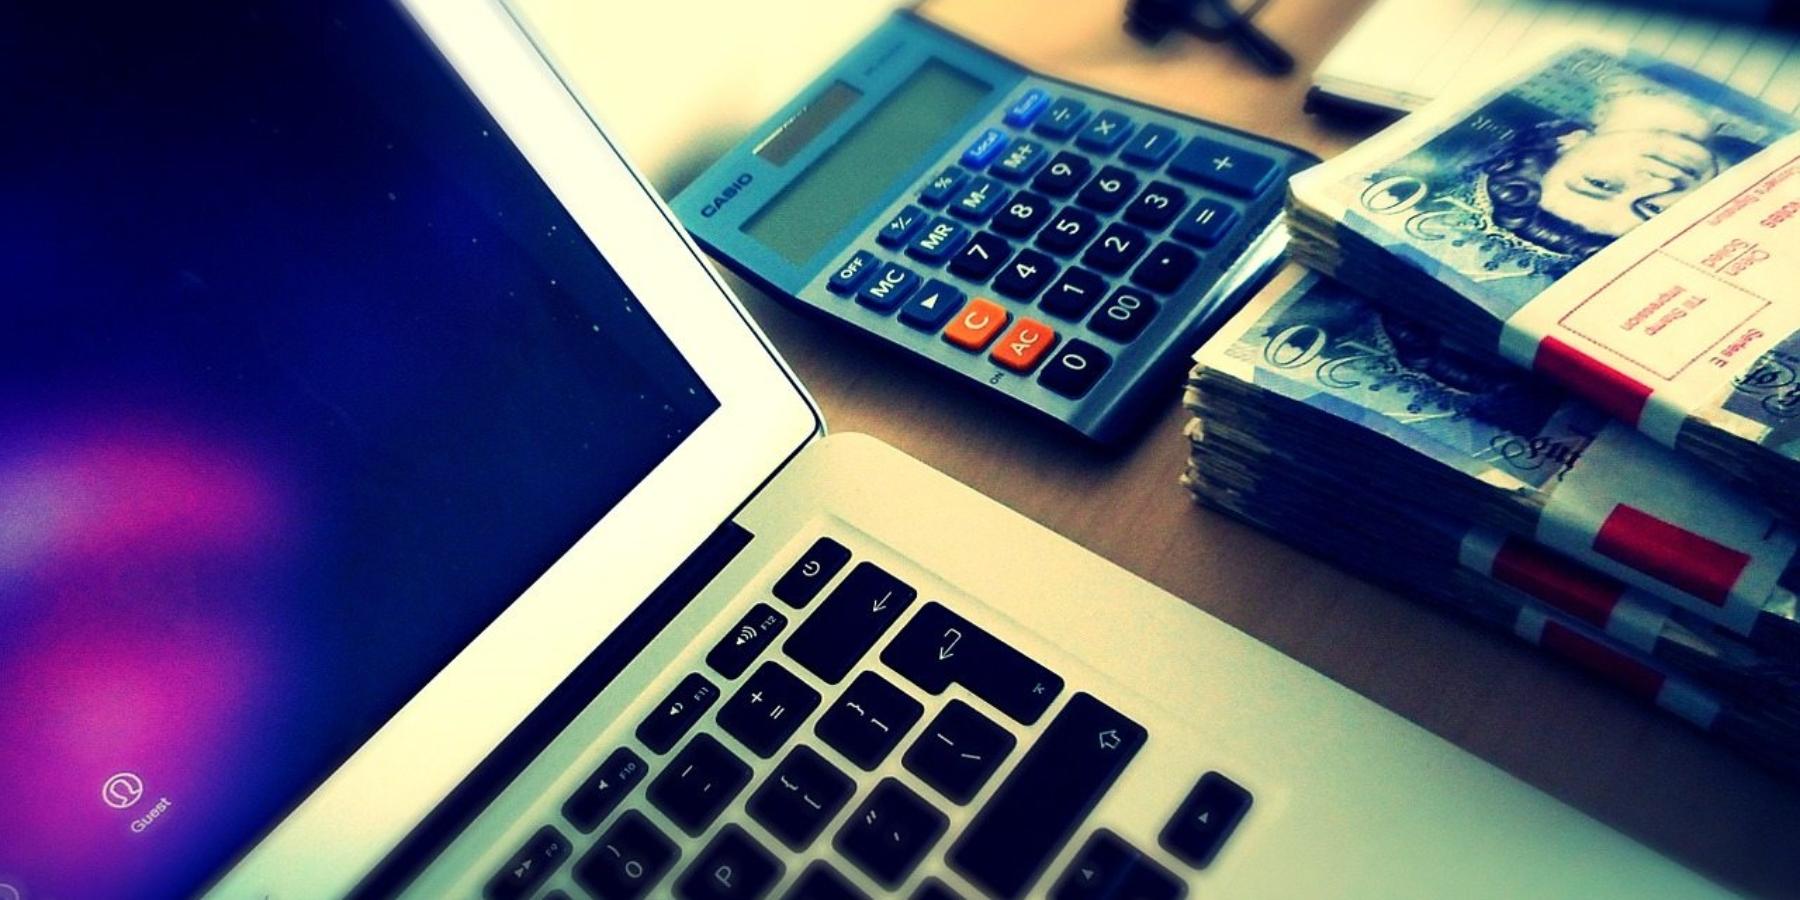 # 22 Prasówka e-commerce – Topmall zmieni się wMerlin Commerce